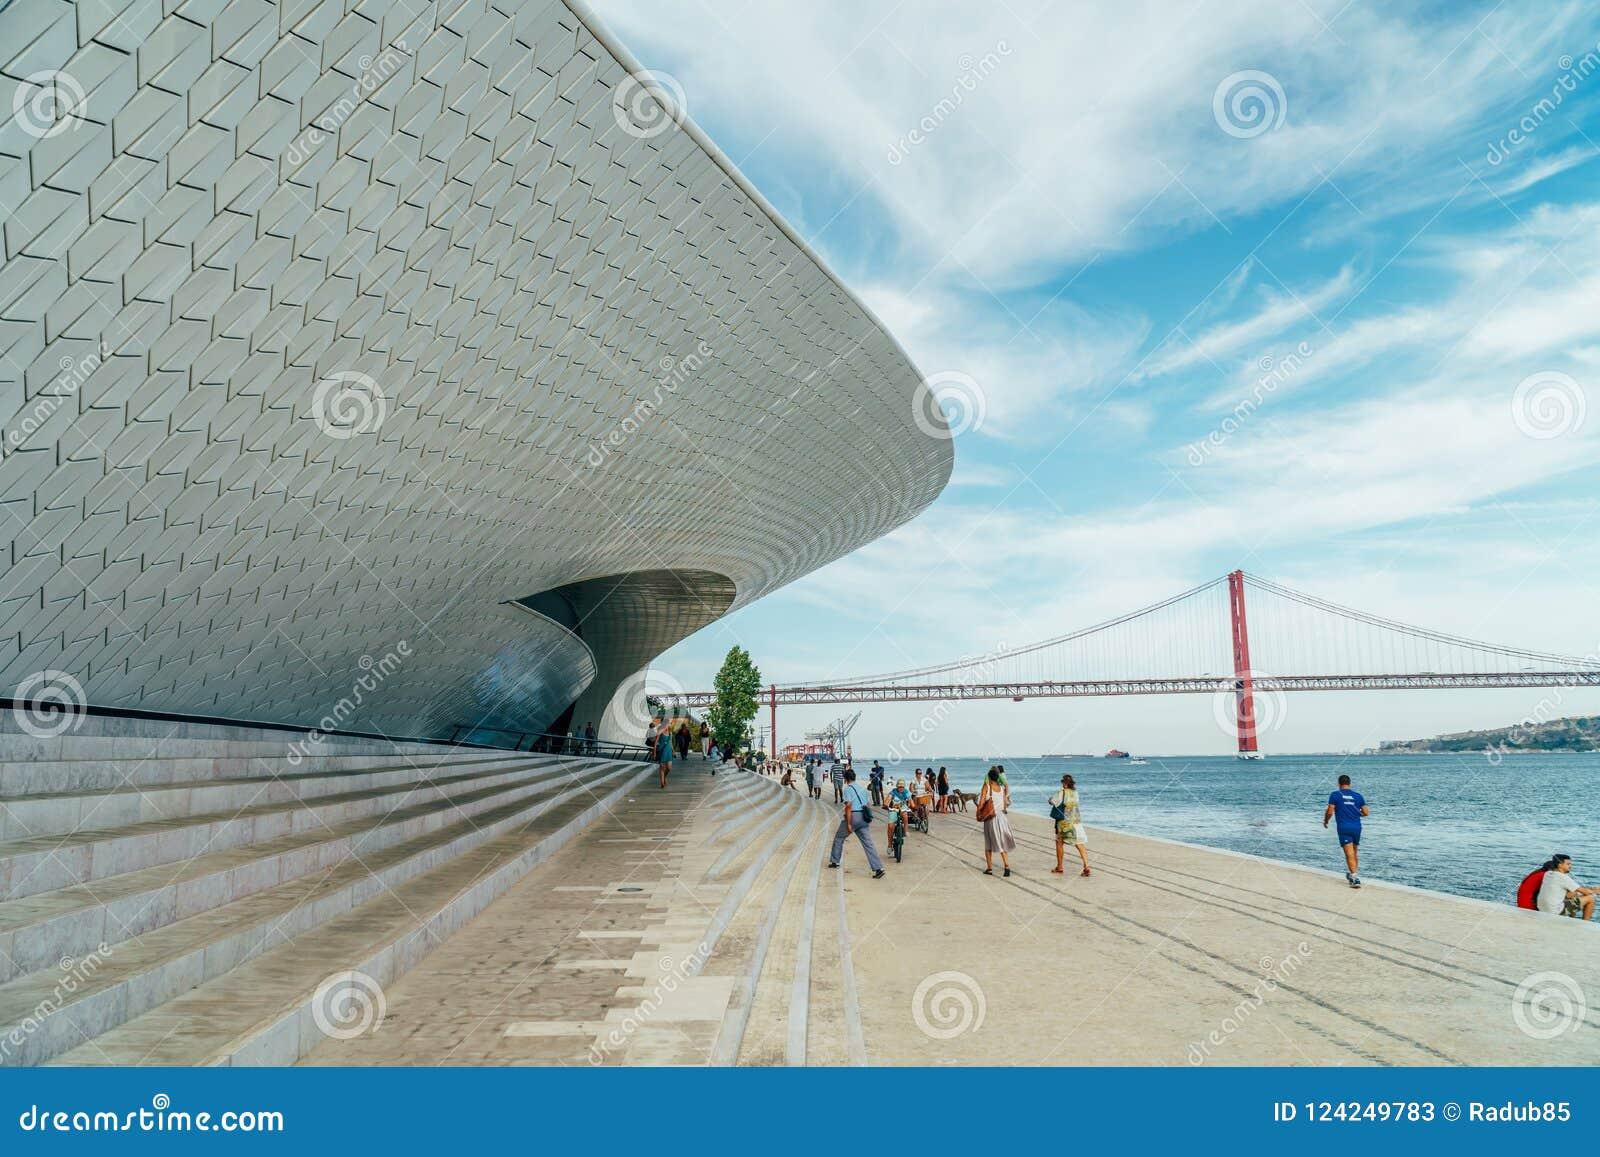 The New Museum Of Art, Architecture and Technology Museu de Arte, Arquitetura e Tecnologia Or MAAT